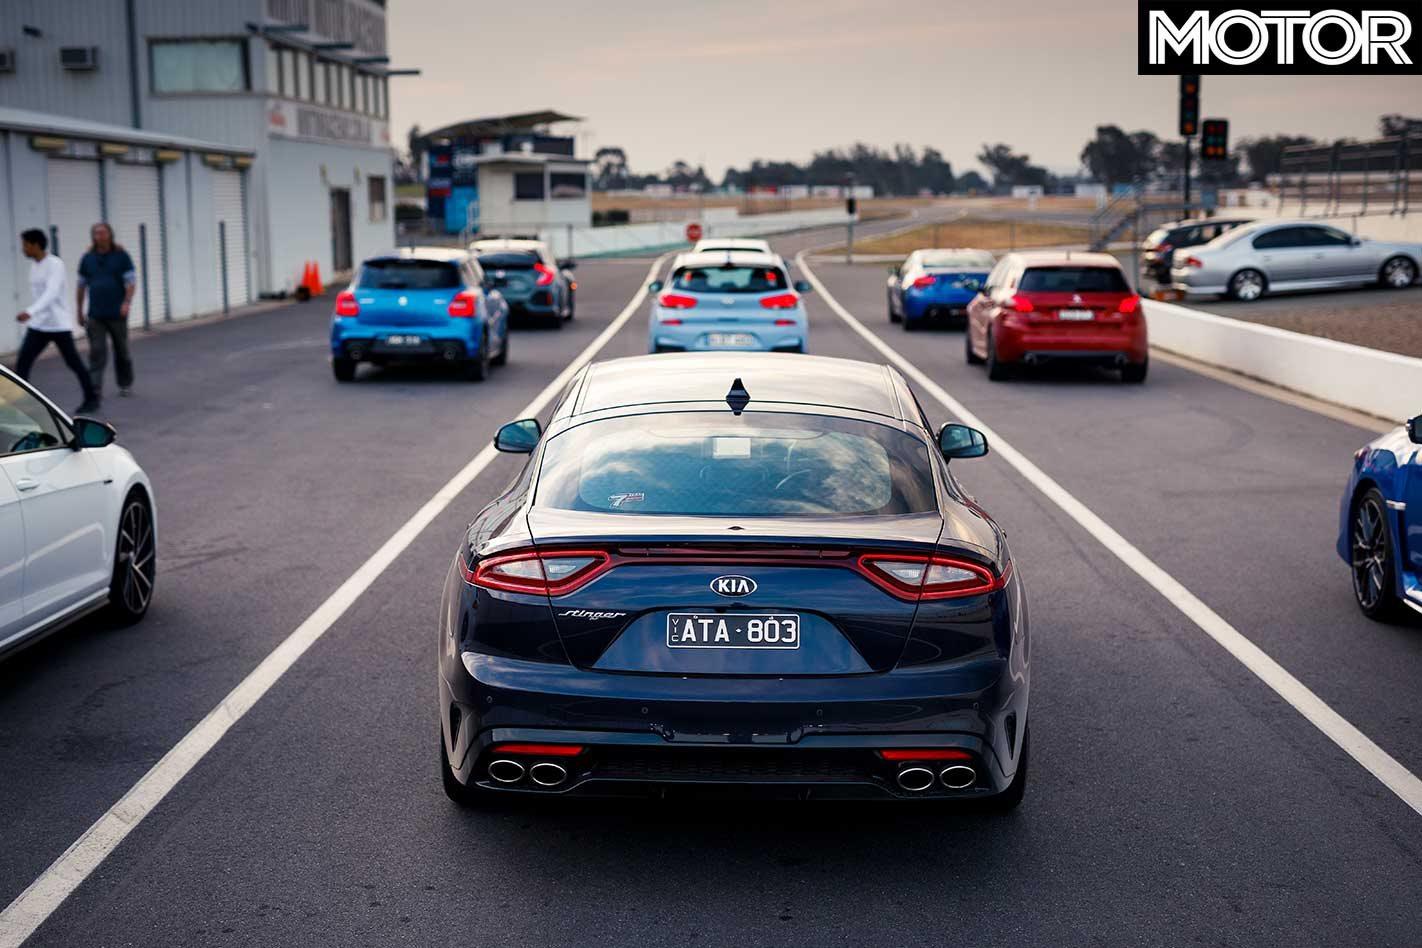 MOTOR Best Value Performance Cars: Bang For Your Bucks 2018